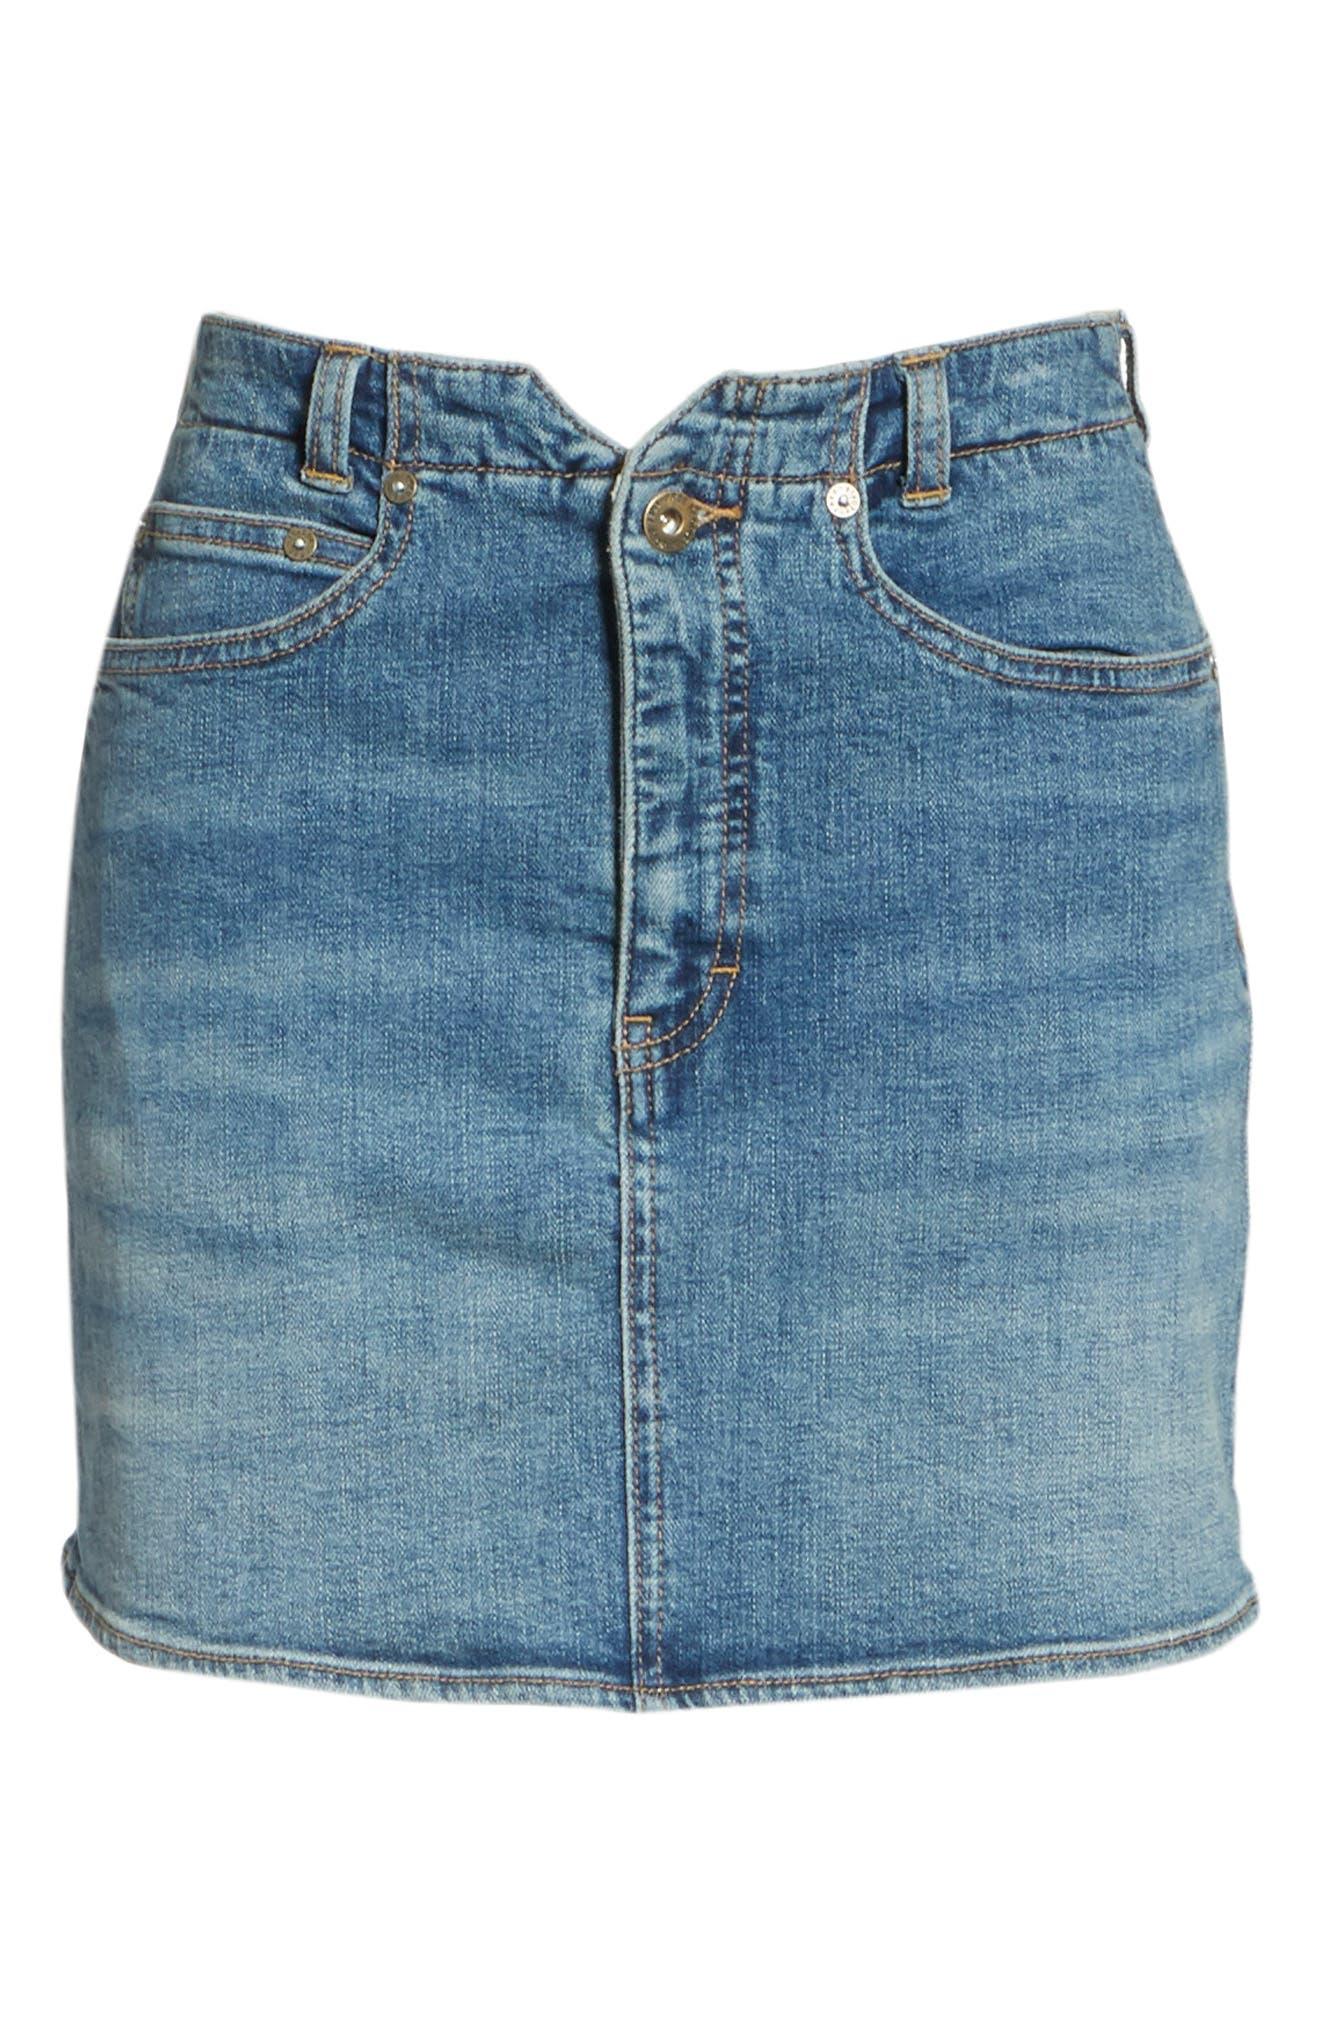 FREE PEOPLE,                             She's All That Denim Miniskirt,                             Alternate thumbnail 7, color,                             425